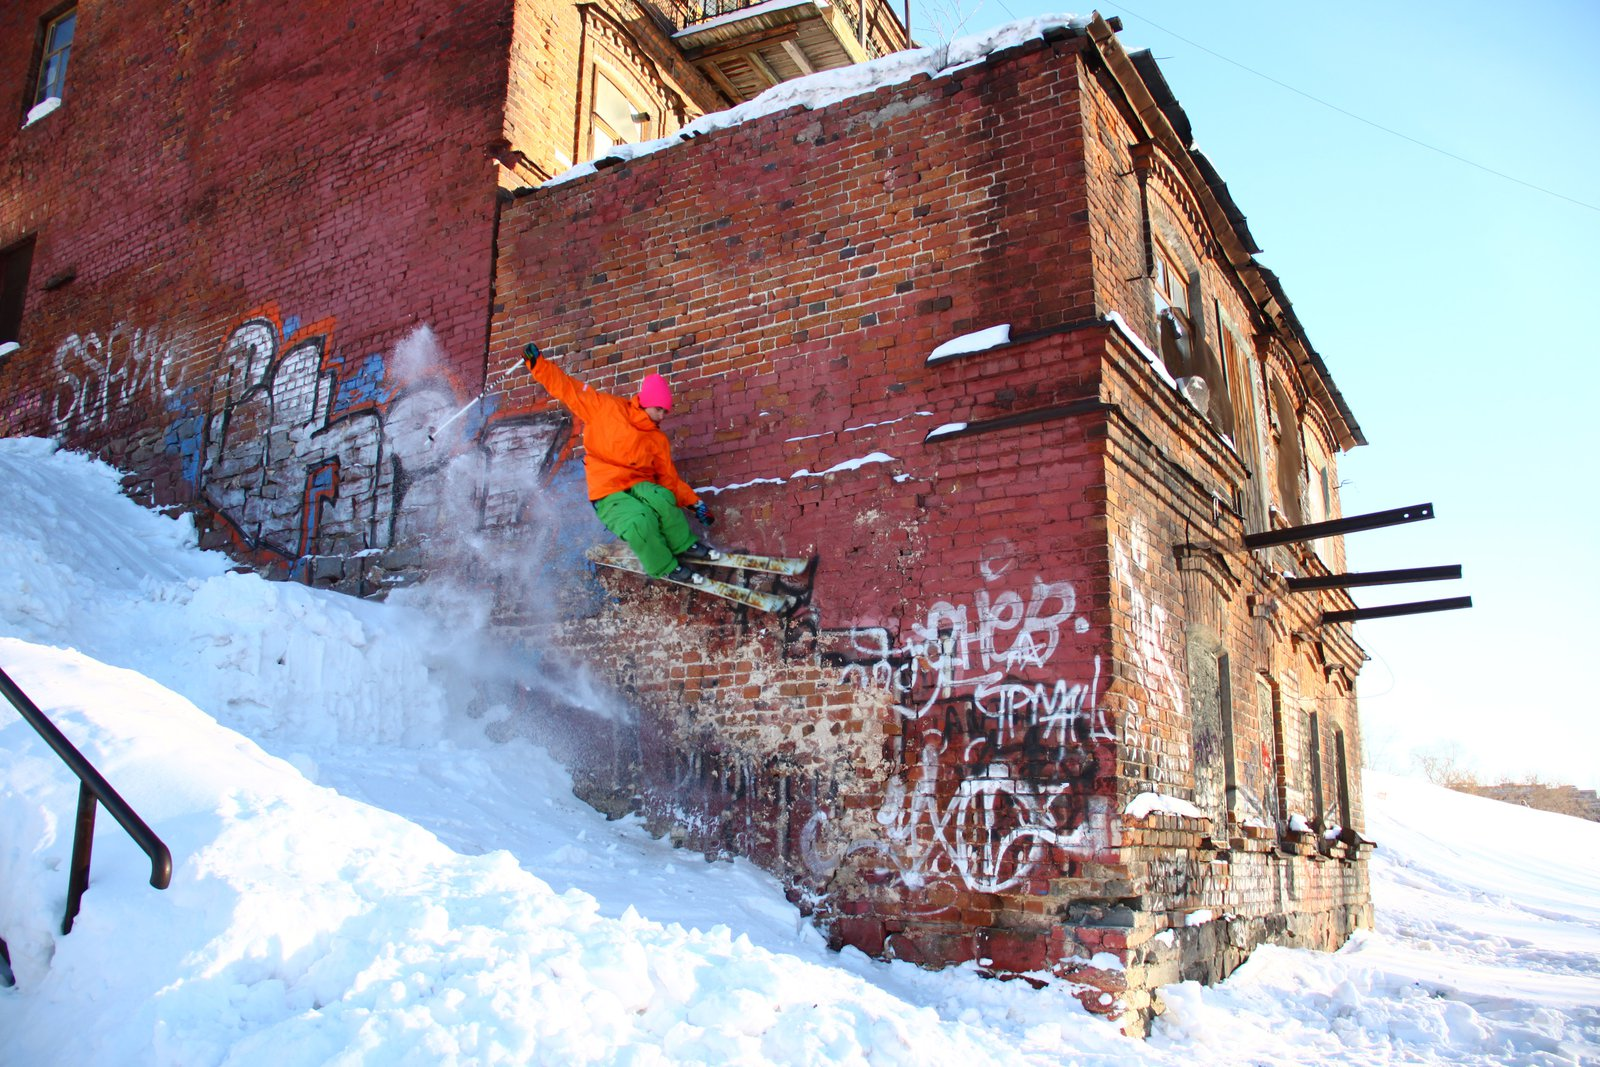 Street Ski Art